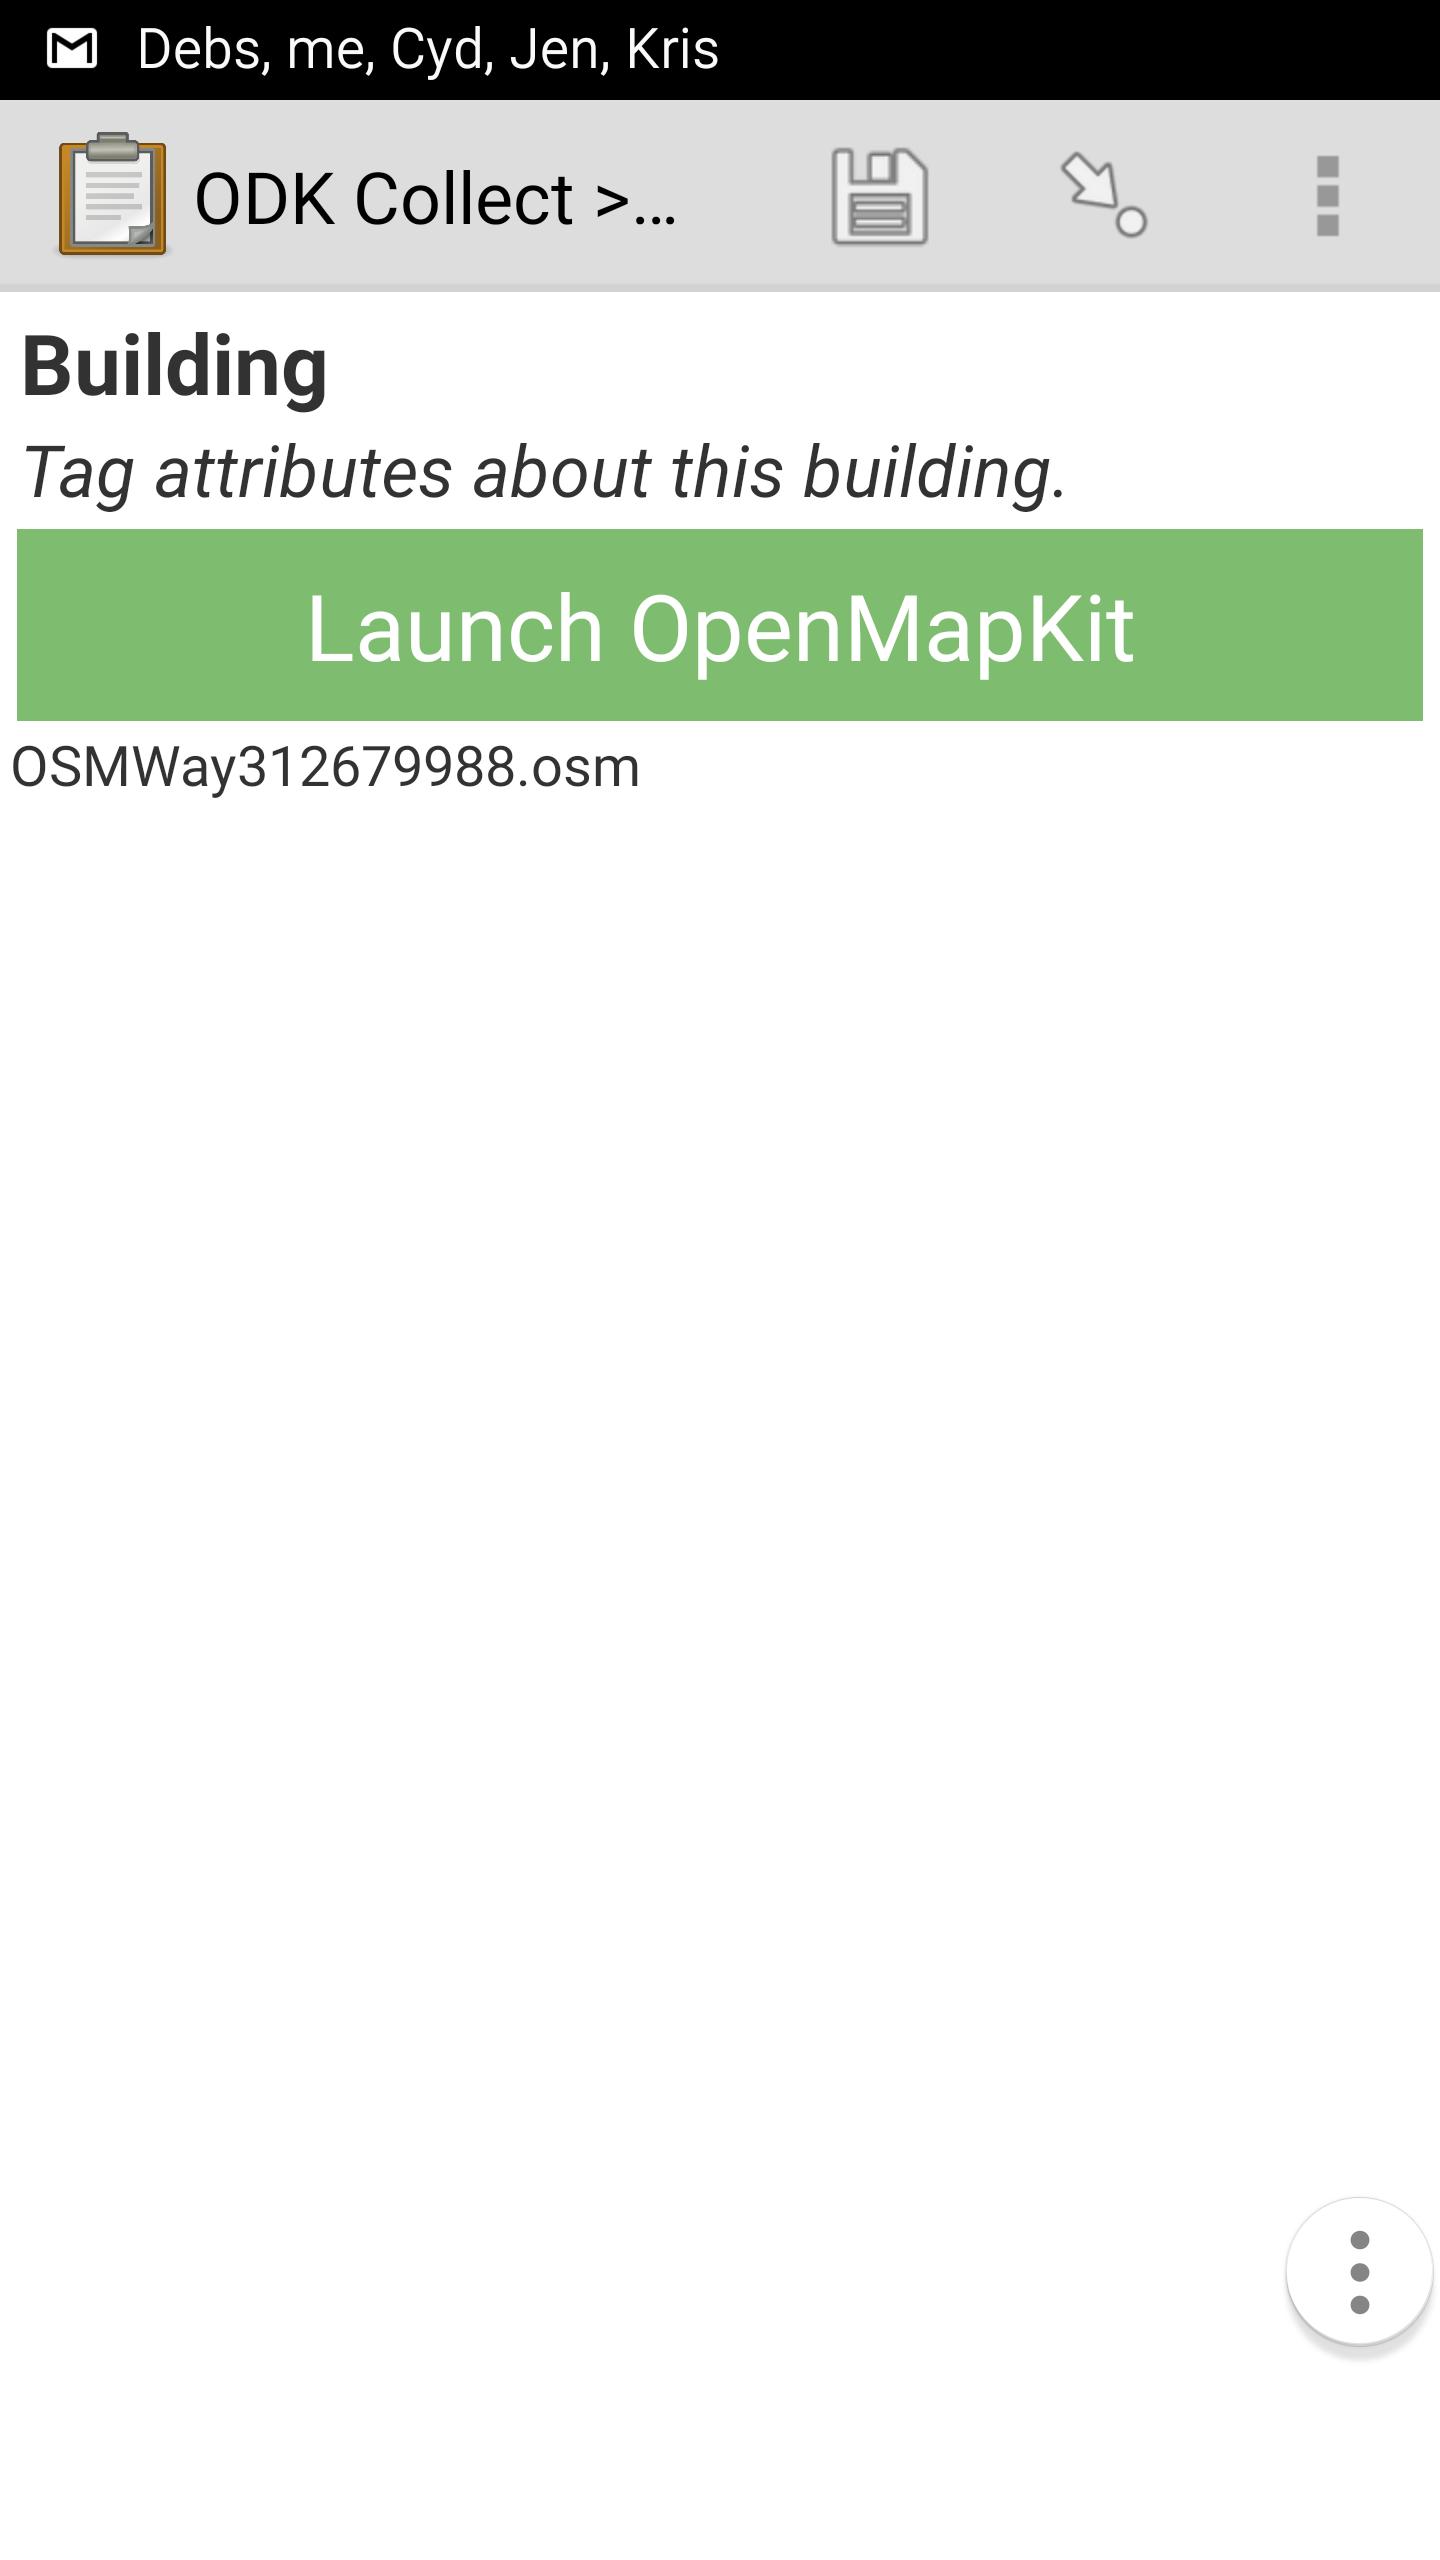 https://cloud.githubusercontent.com/assets/506078/7143824/418dea64-e296-11e4-8939-3fc81b30facd.png